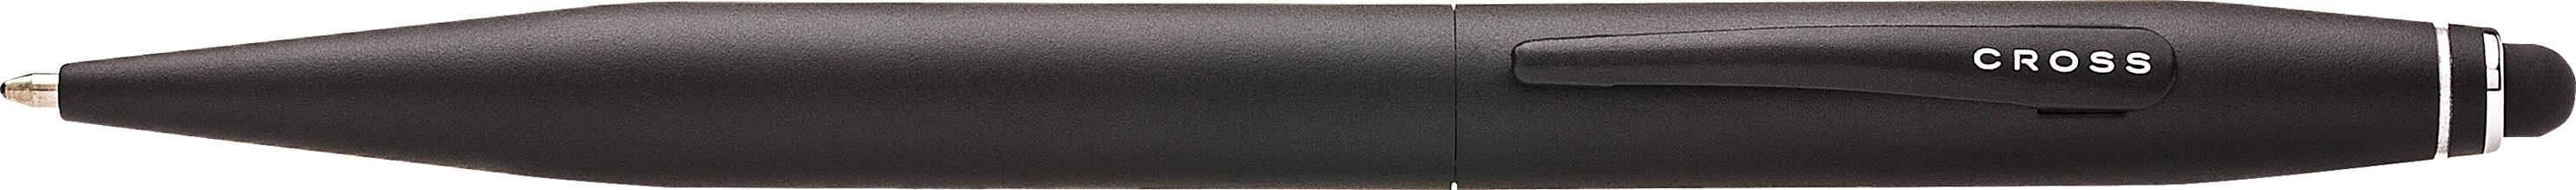 Tech 2 Satin Black Ballpoint Pen